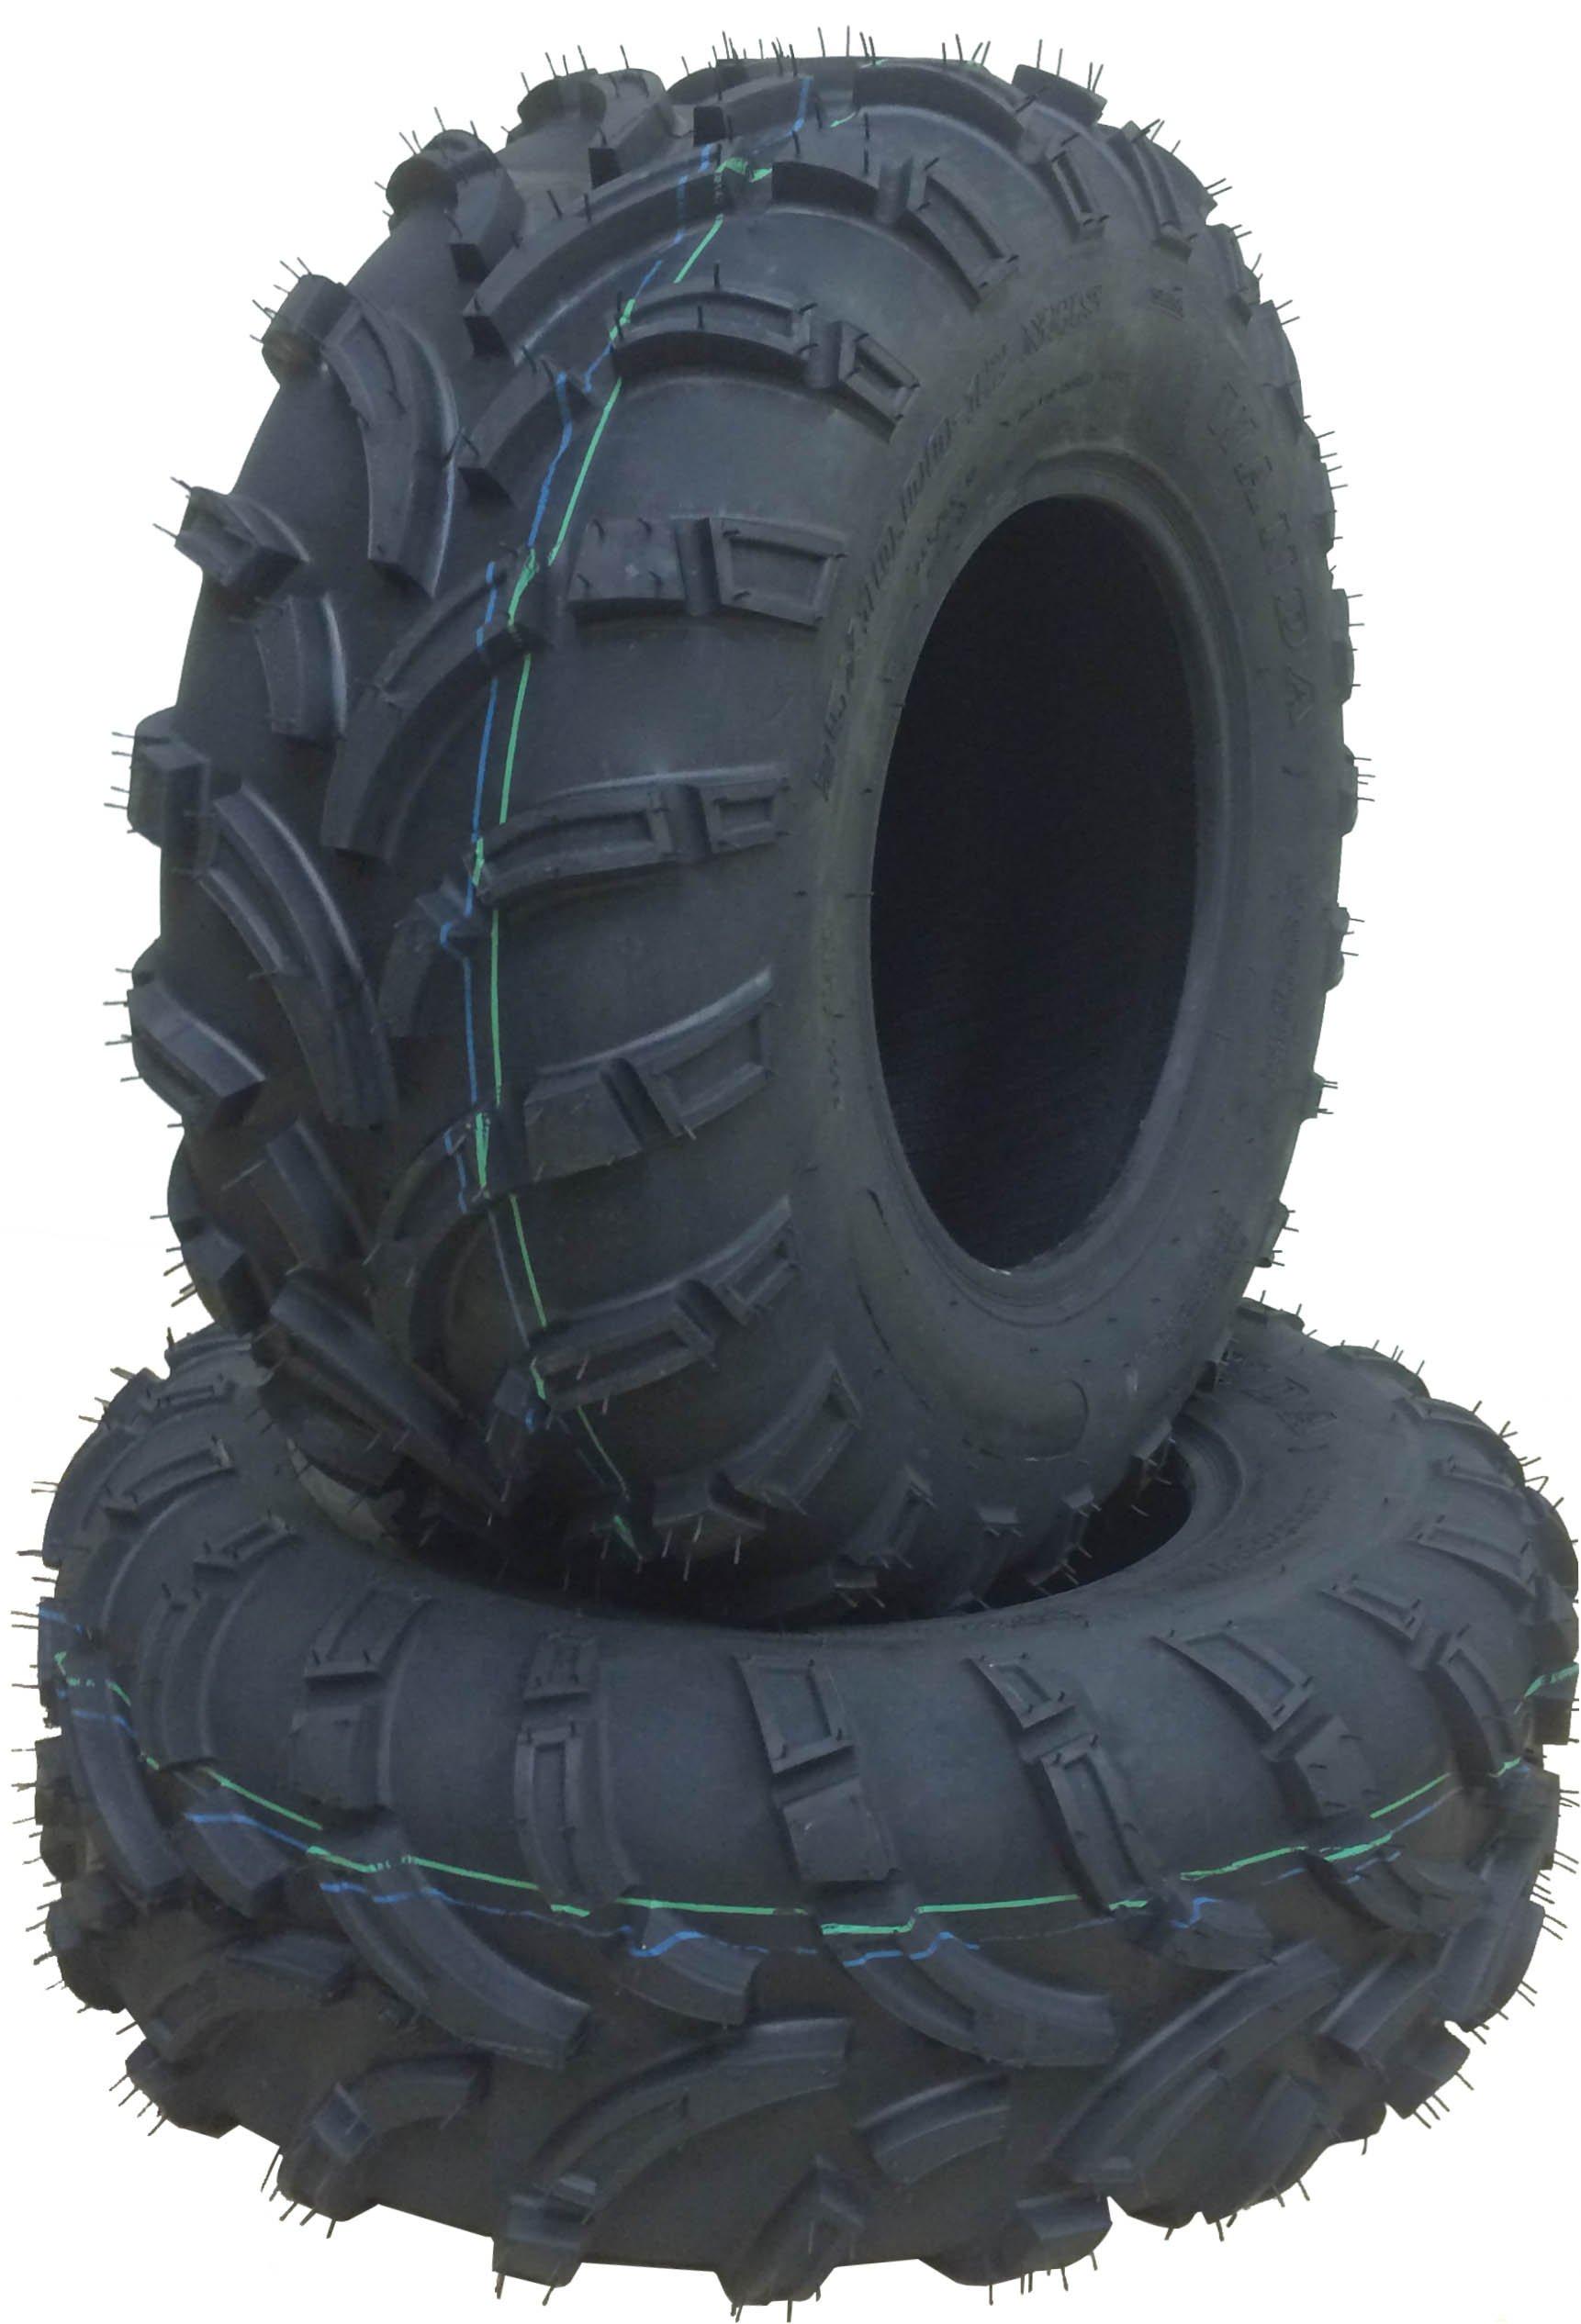 Set of 2 New WANDA ATV/UTV Tires 25x10-12 /6PR P373 High Load tires …